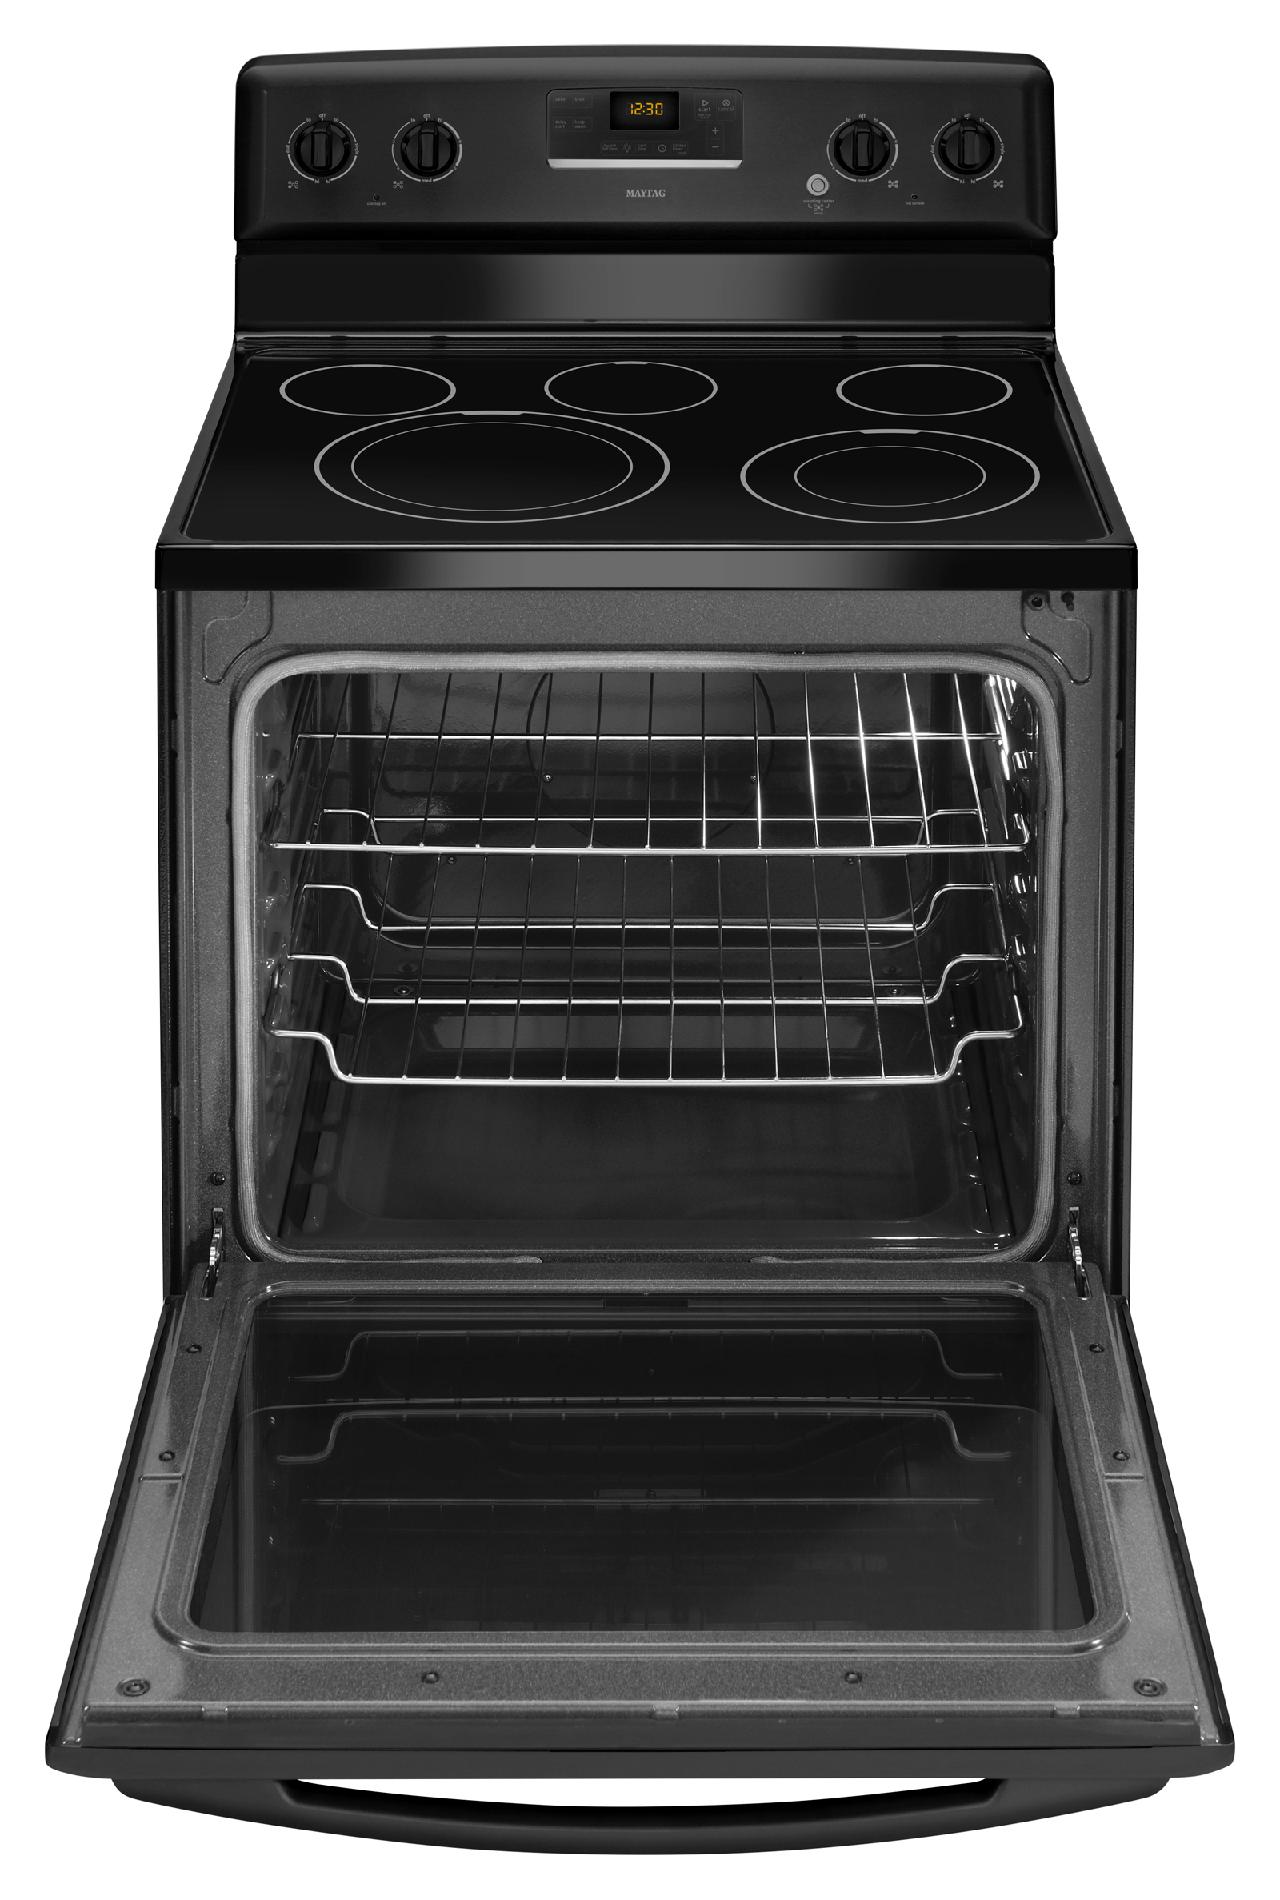 "Maytag 30"" Electric Range w/ Aqua-Lift® Self-Clean Technology - Black"